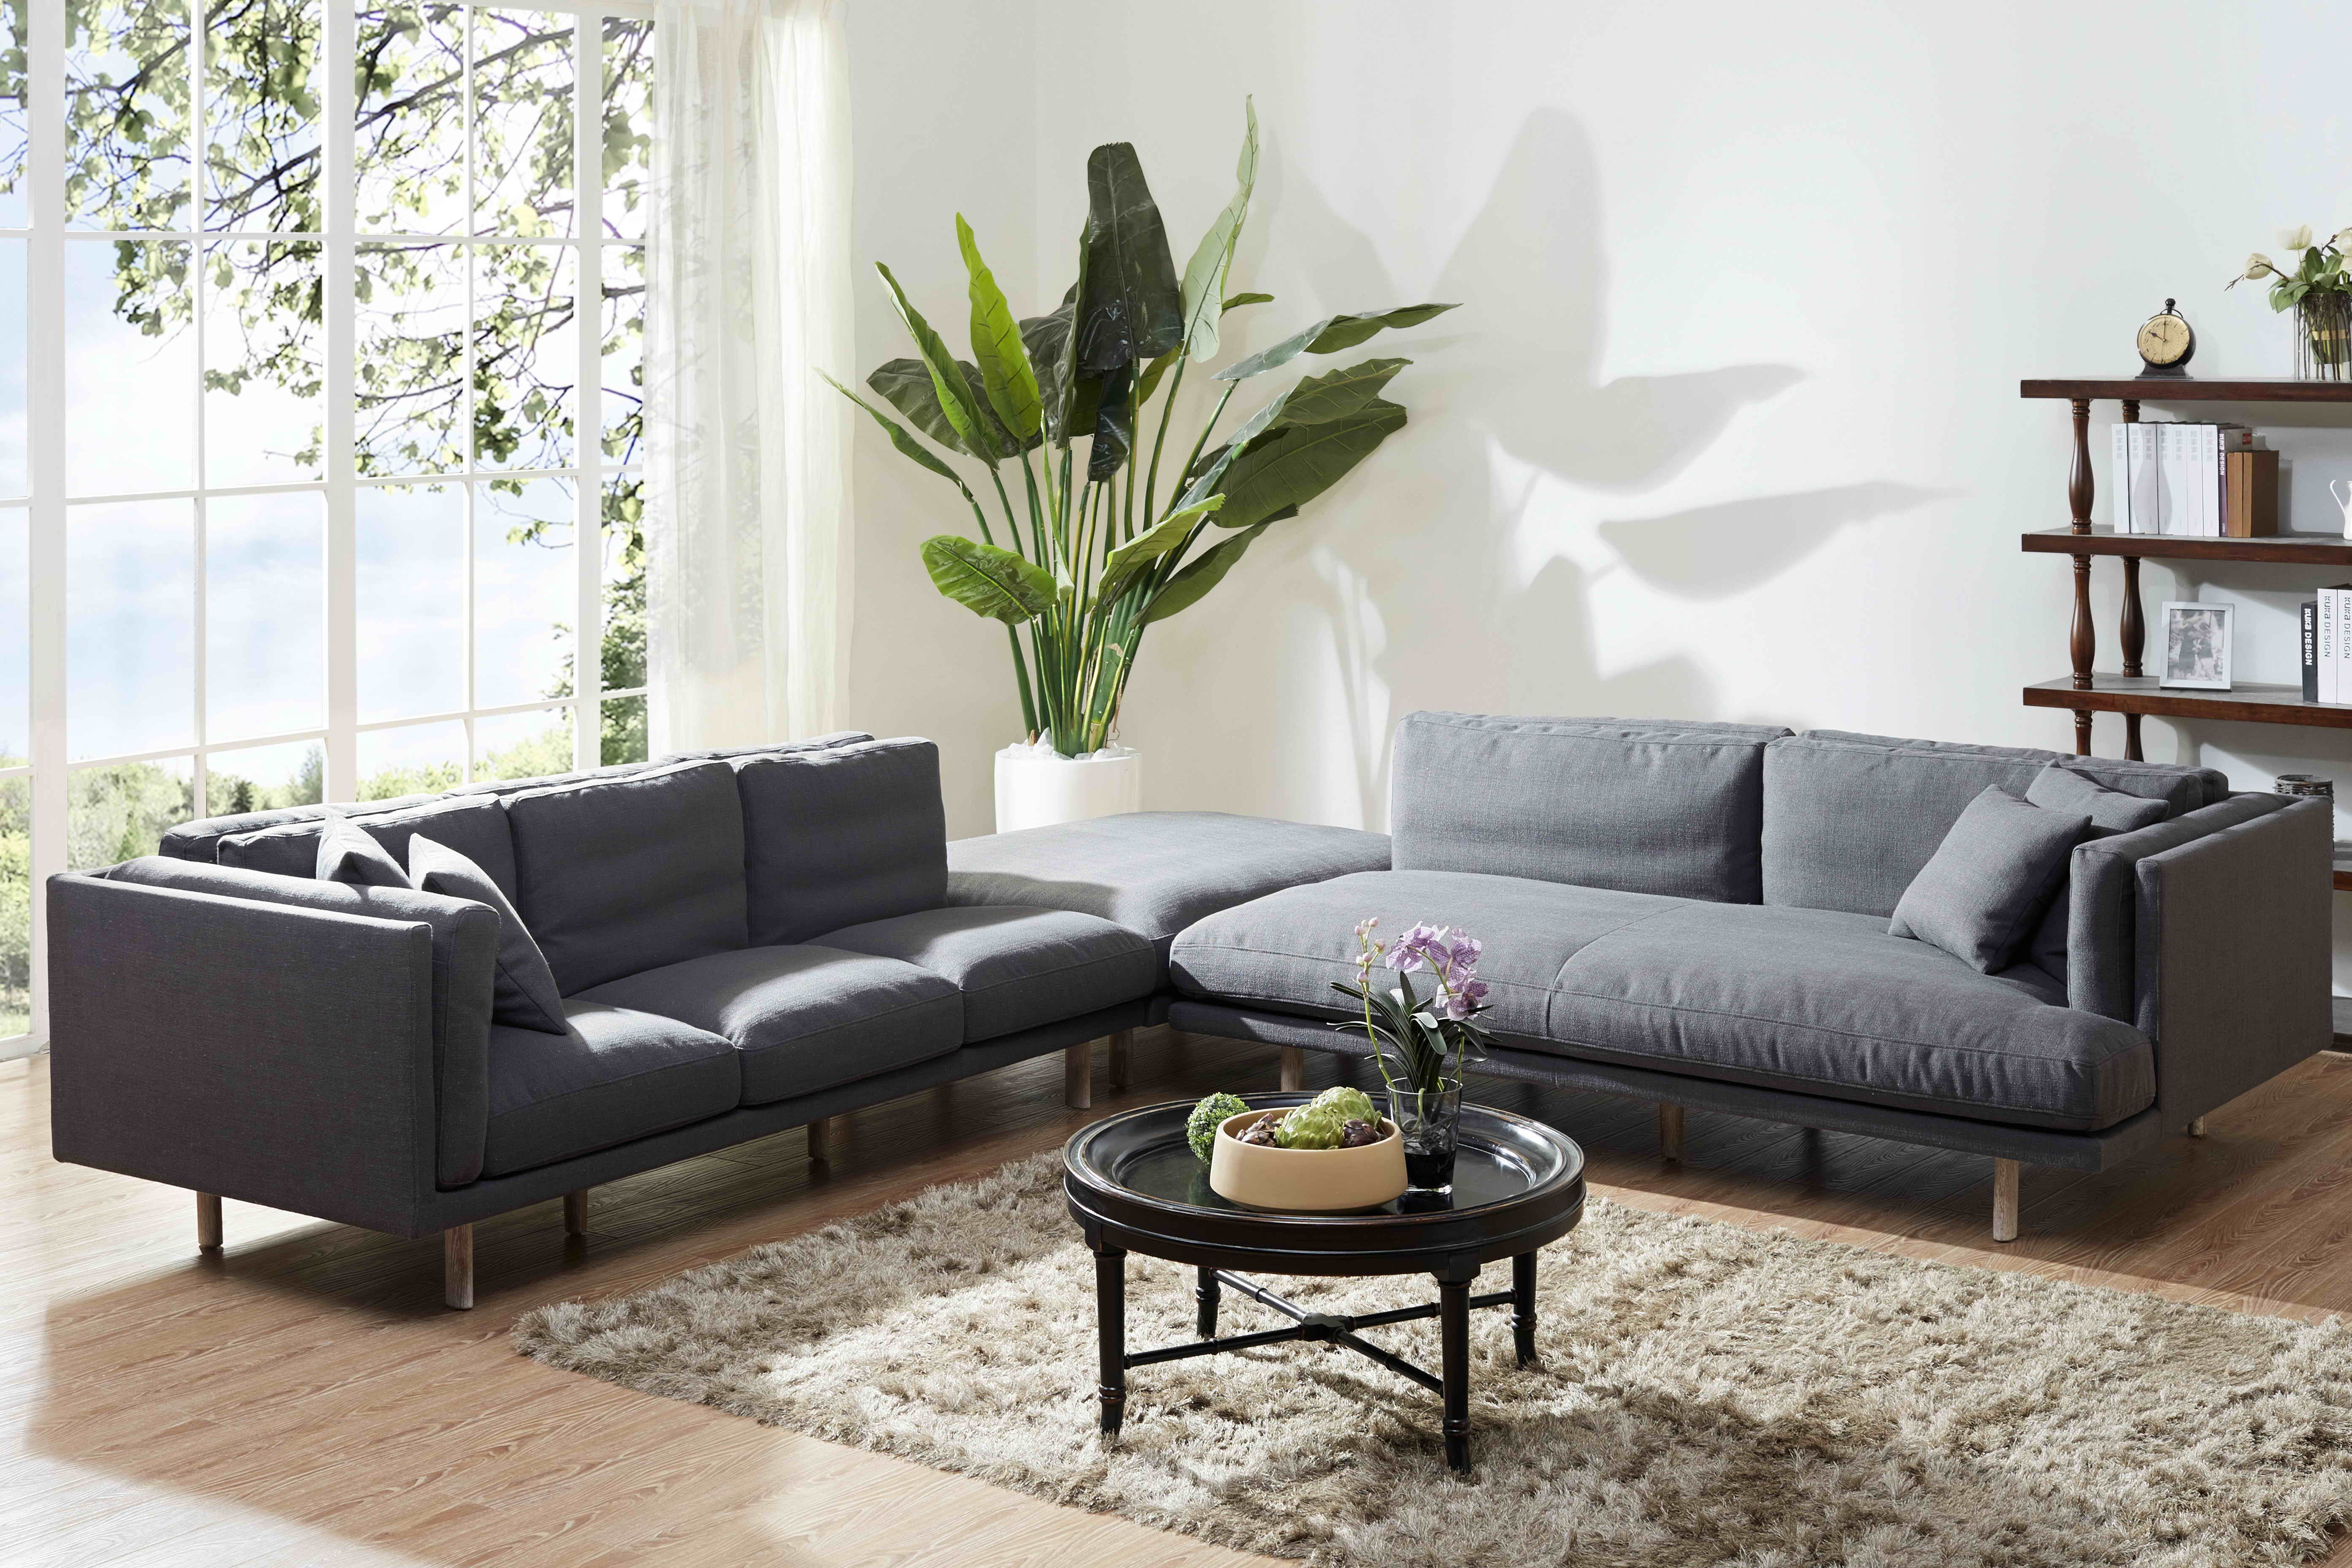 Best Selling Kukahome Fabric Sofa Kuka 067 Home Living Room Living Room Bedroom Upholstered Furniture